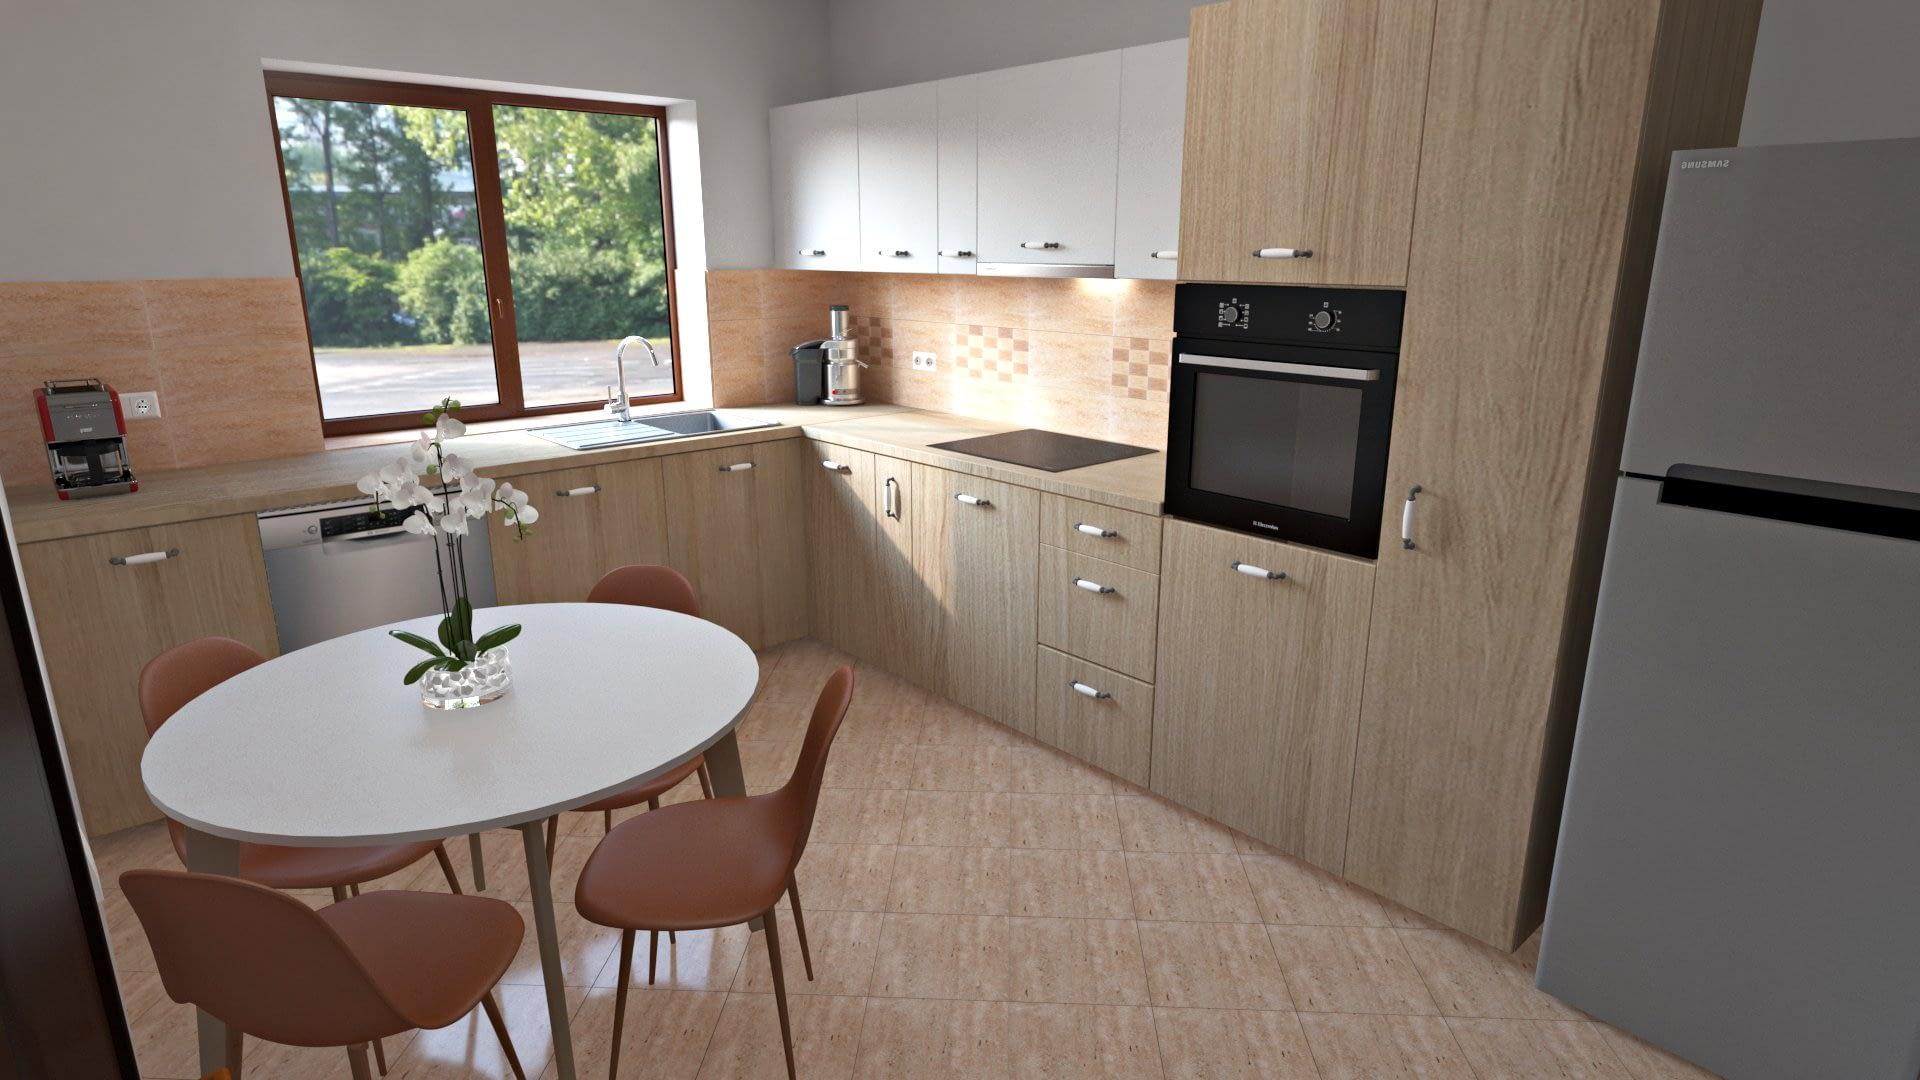 Design Interior Bucatararie | Travertin 01